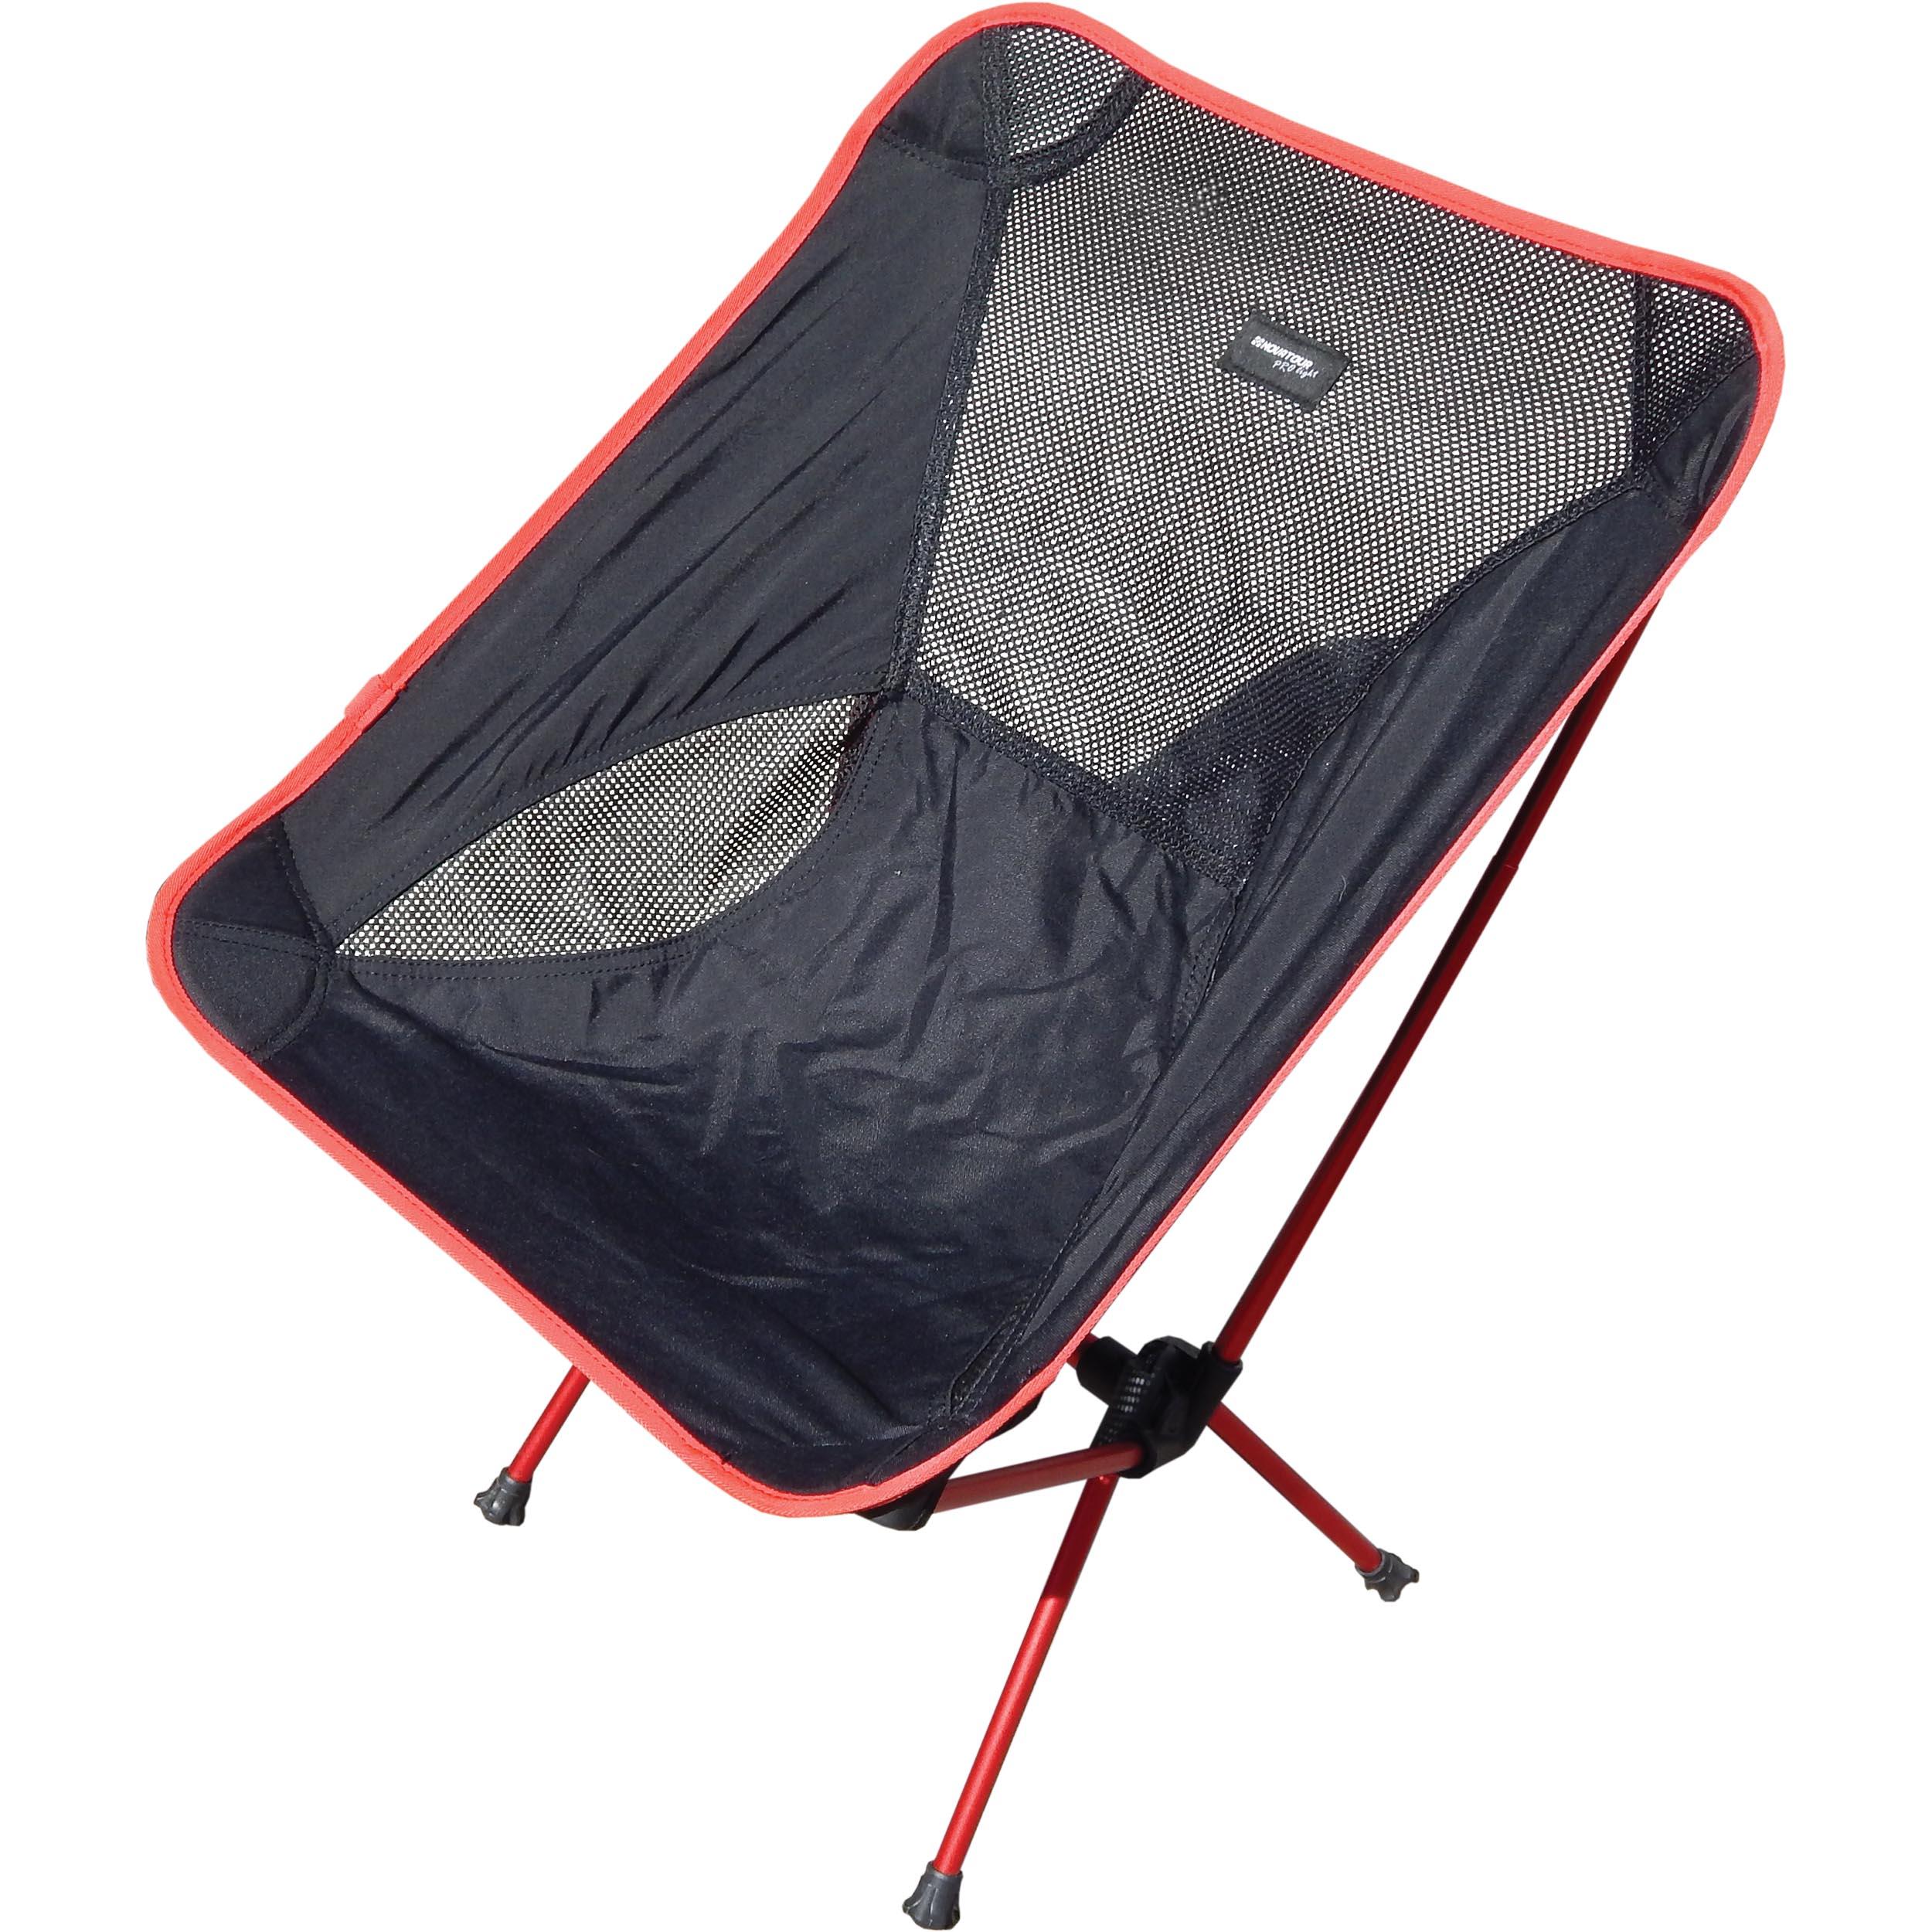 Стул складной Nova tourМебель для кемпинга<br>Тип: стул, Материал: металл, пластик, Максимальная нагрузка: 120<br>